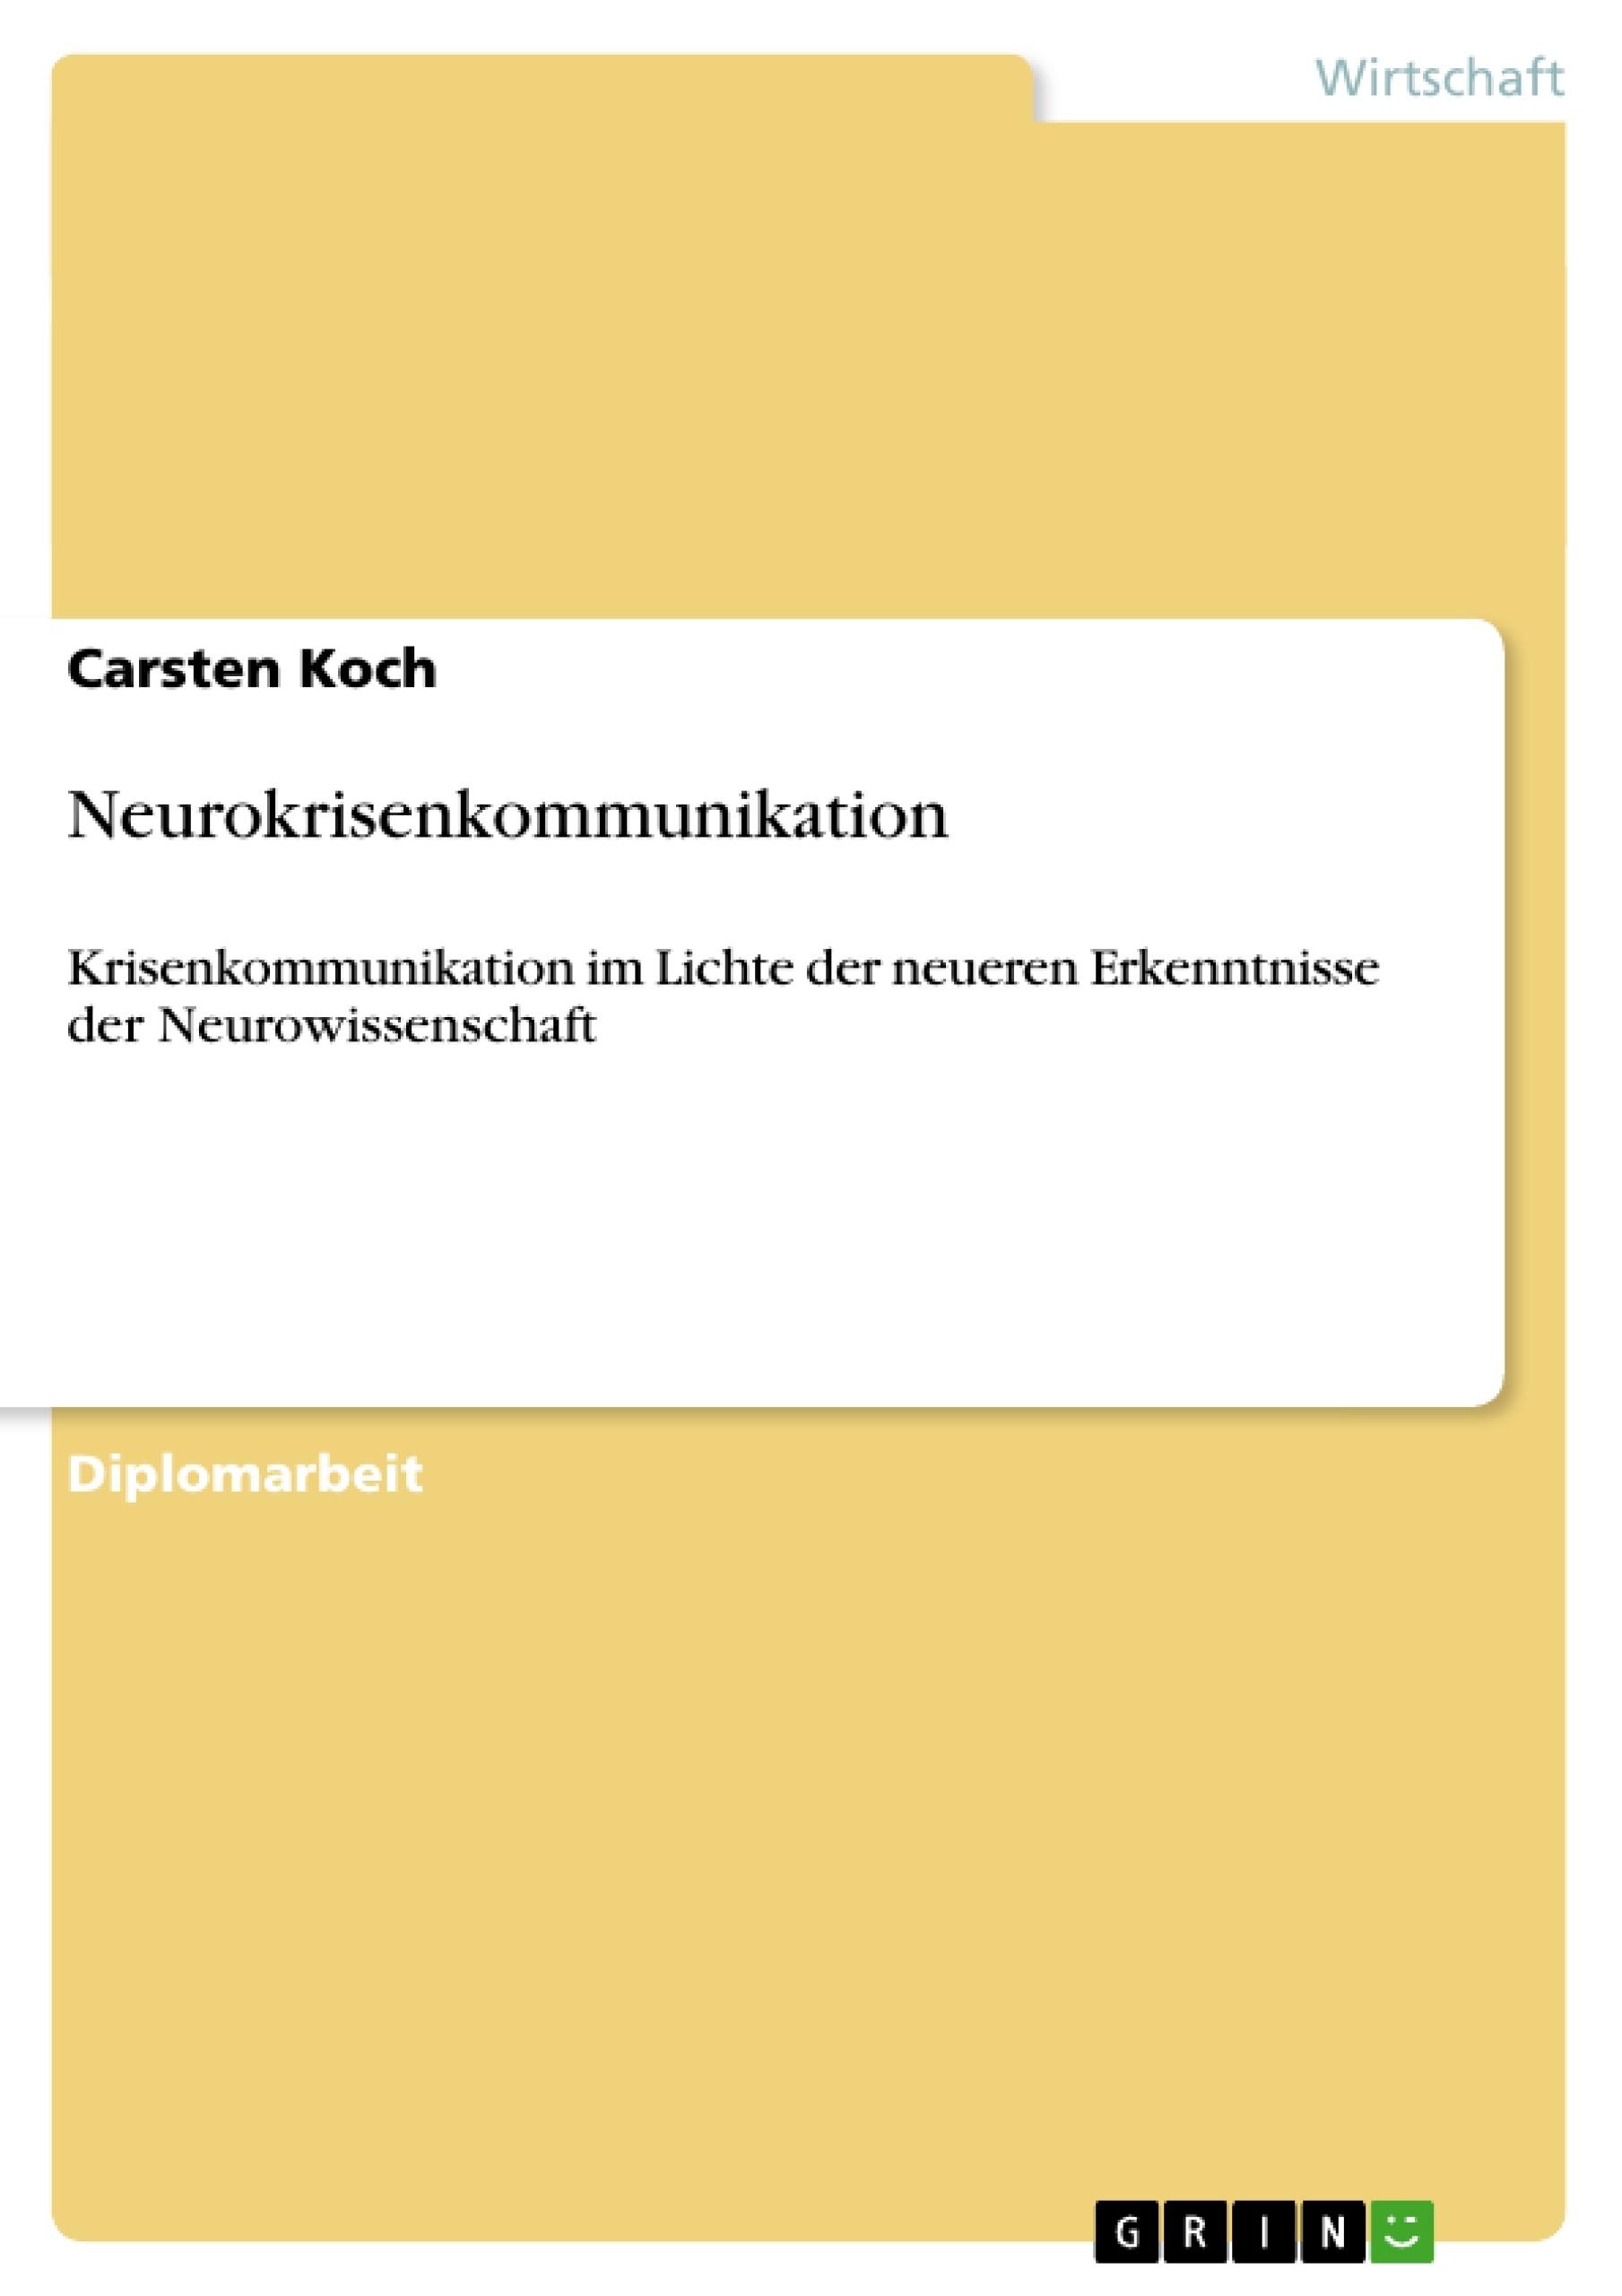 Titel: Neurokrisenkommunikation